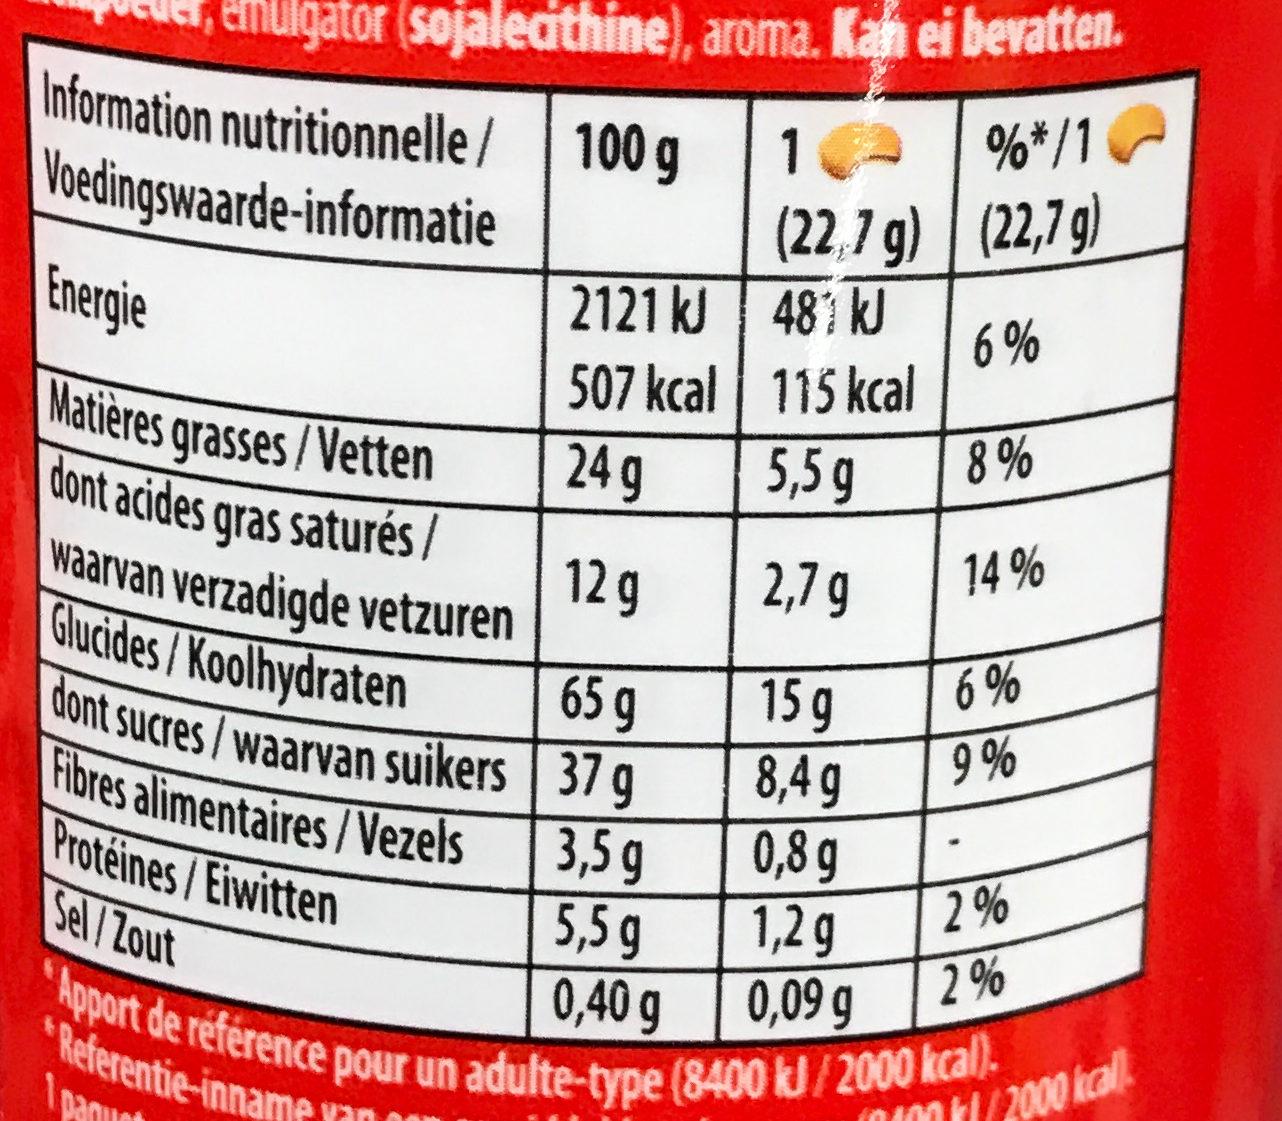 Prince Maxi Gourmand Extra Goût Chocolat - Valori nutrizionali - fr